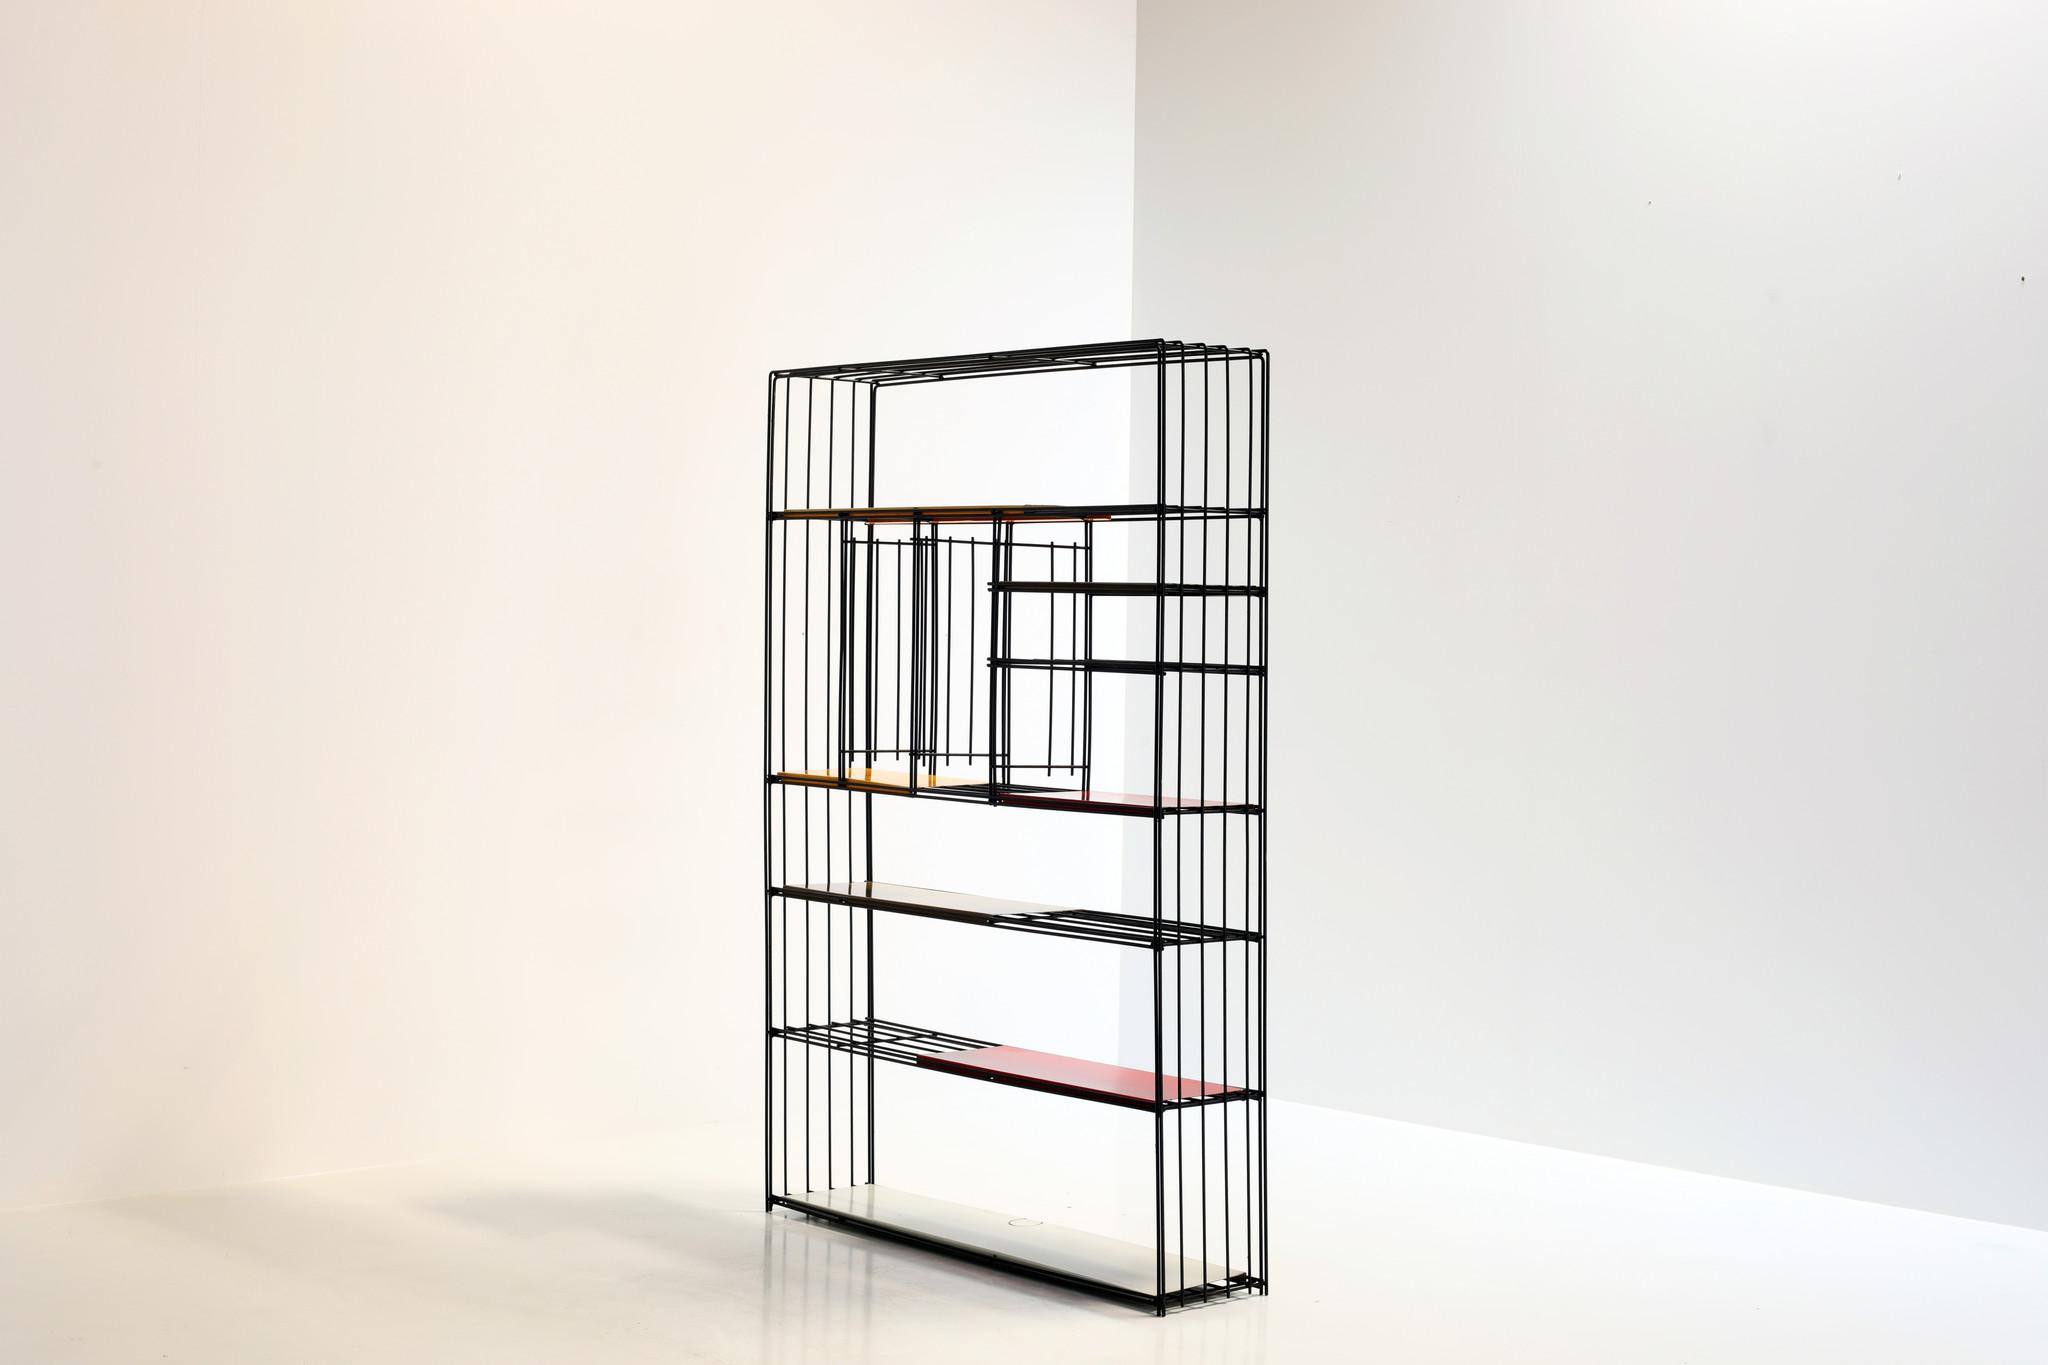 Extra Large Bookshelf by Tjerk Reijenga for Pilastro 1950's